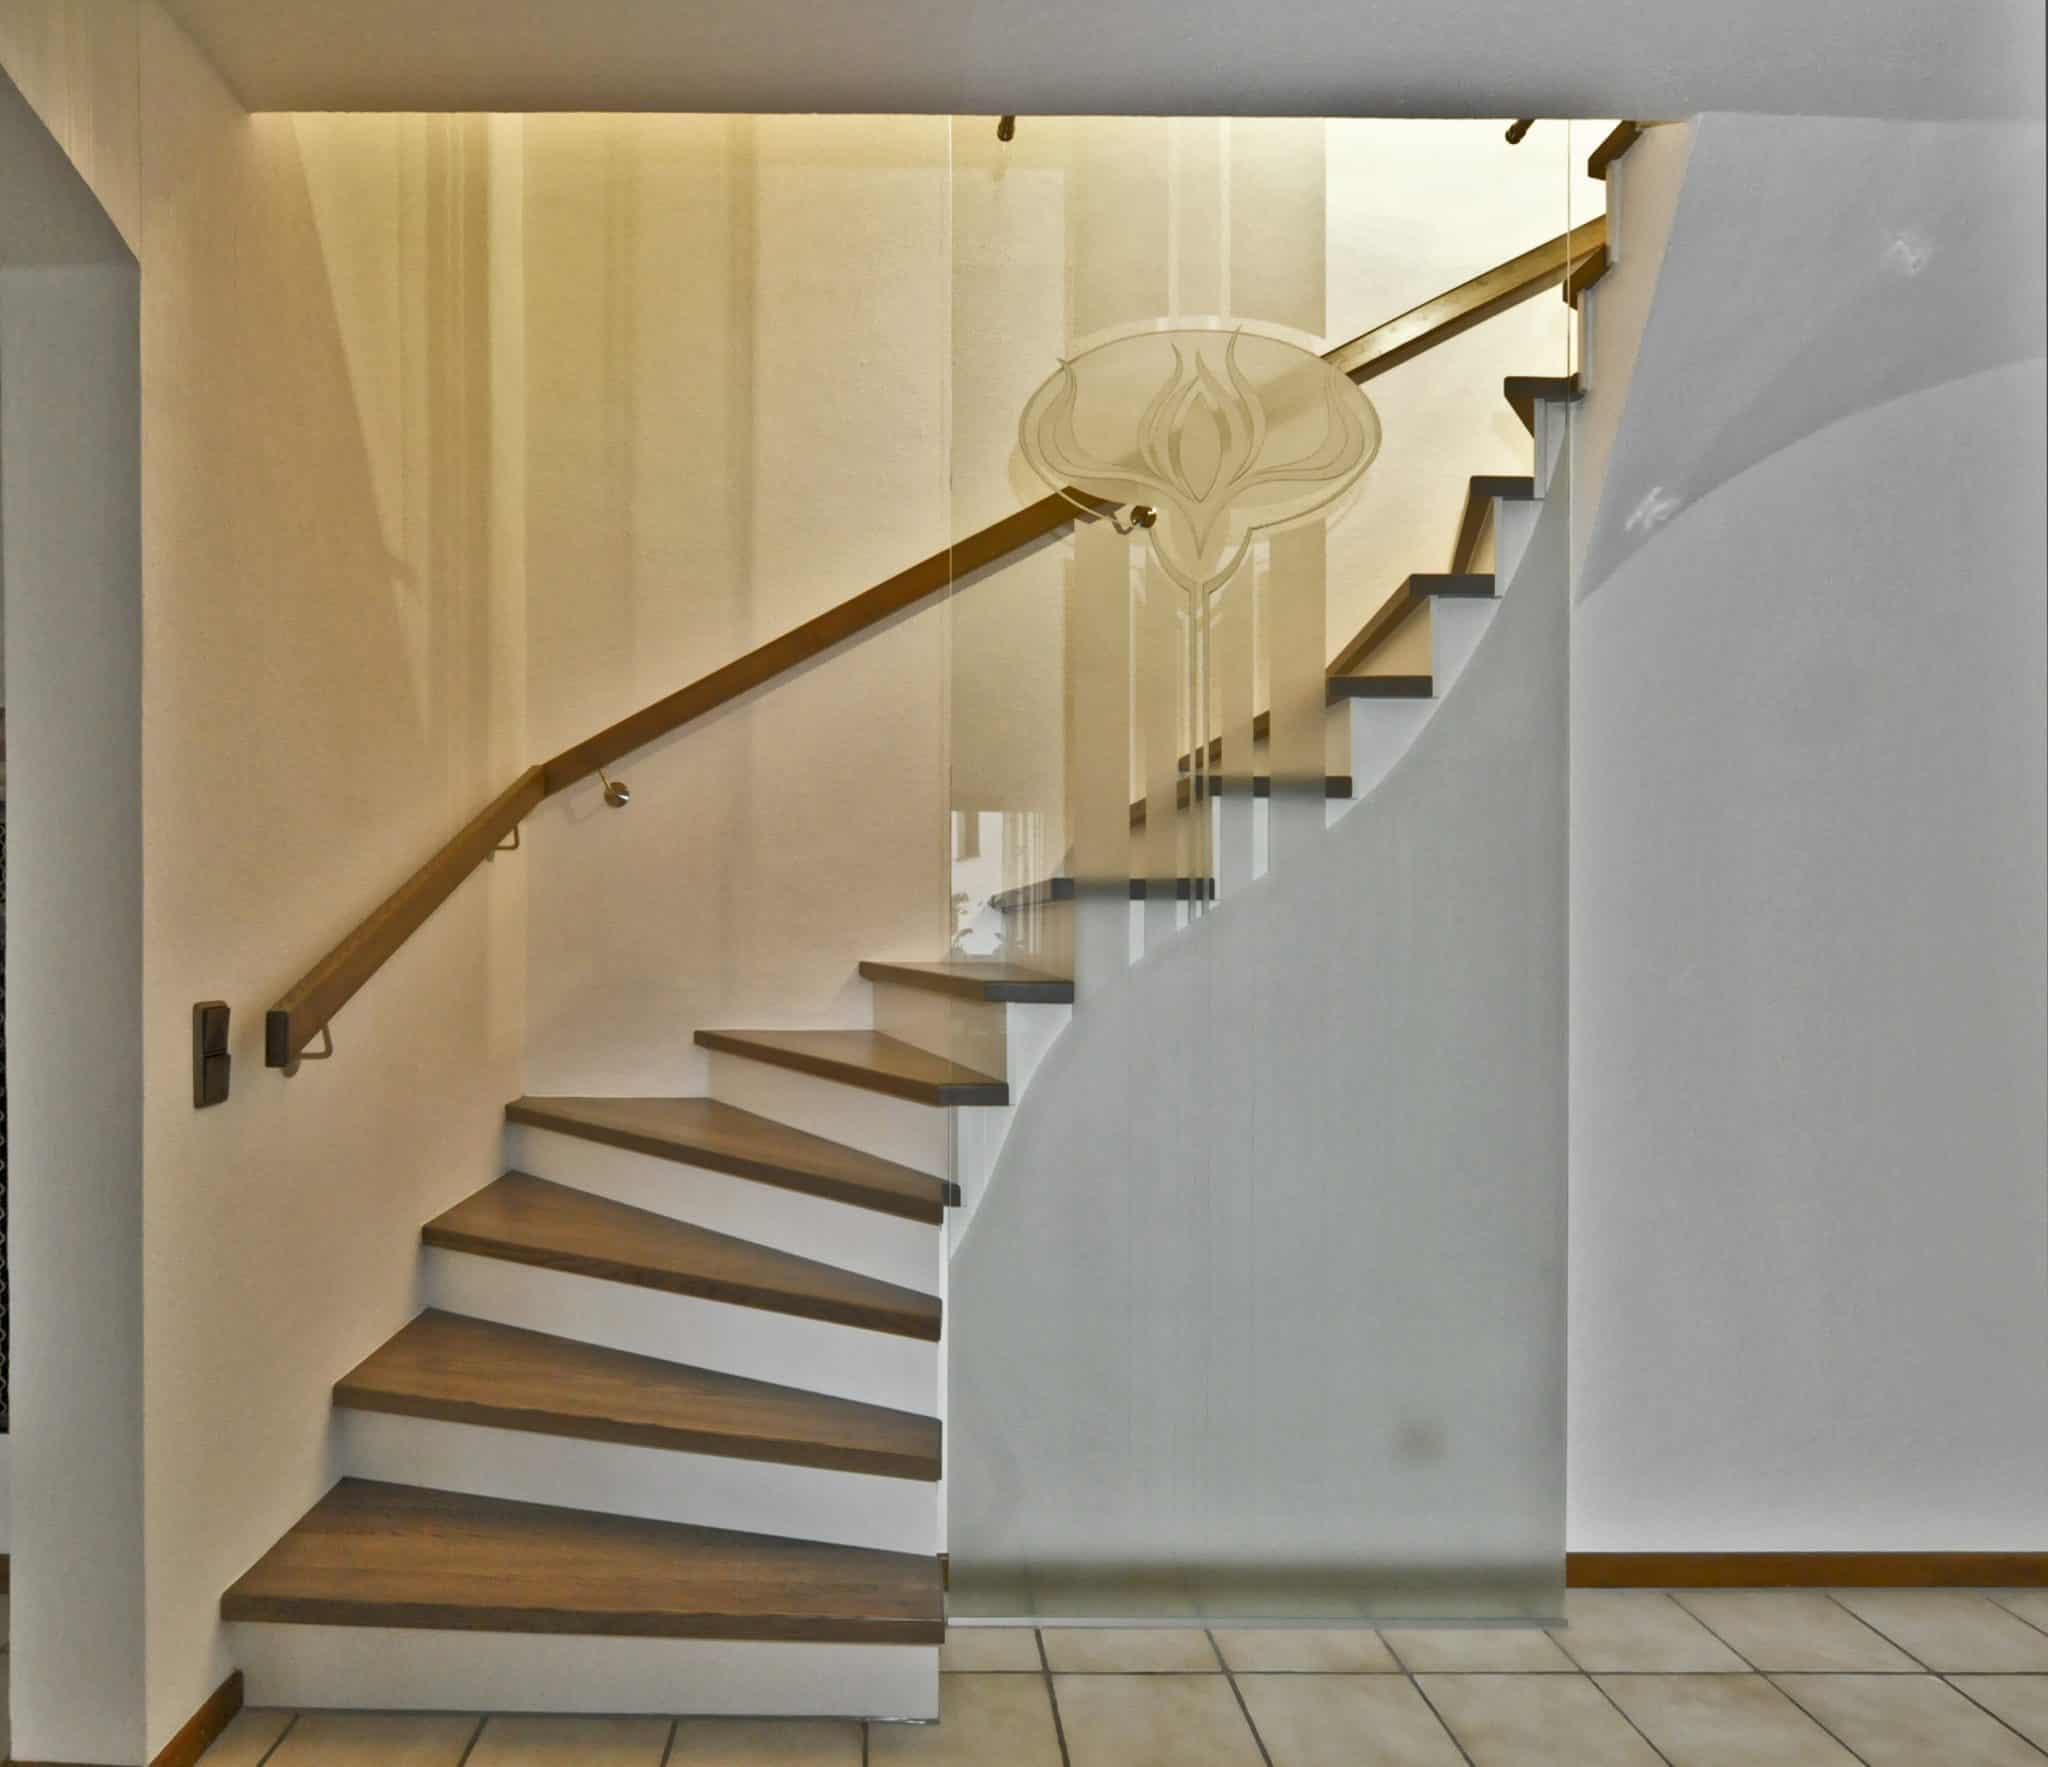 Treppen mit Kepkaverglasung